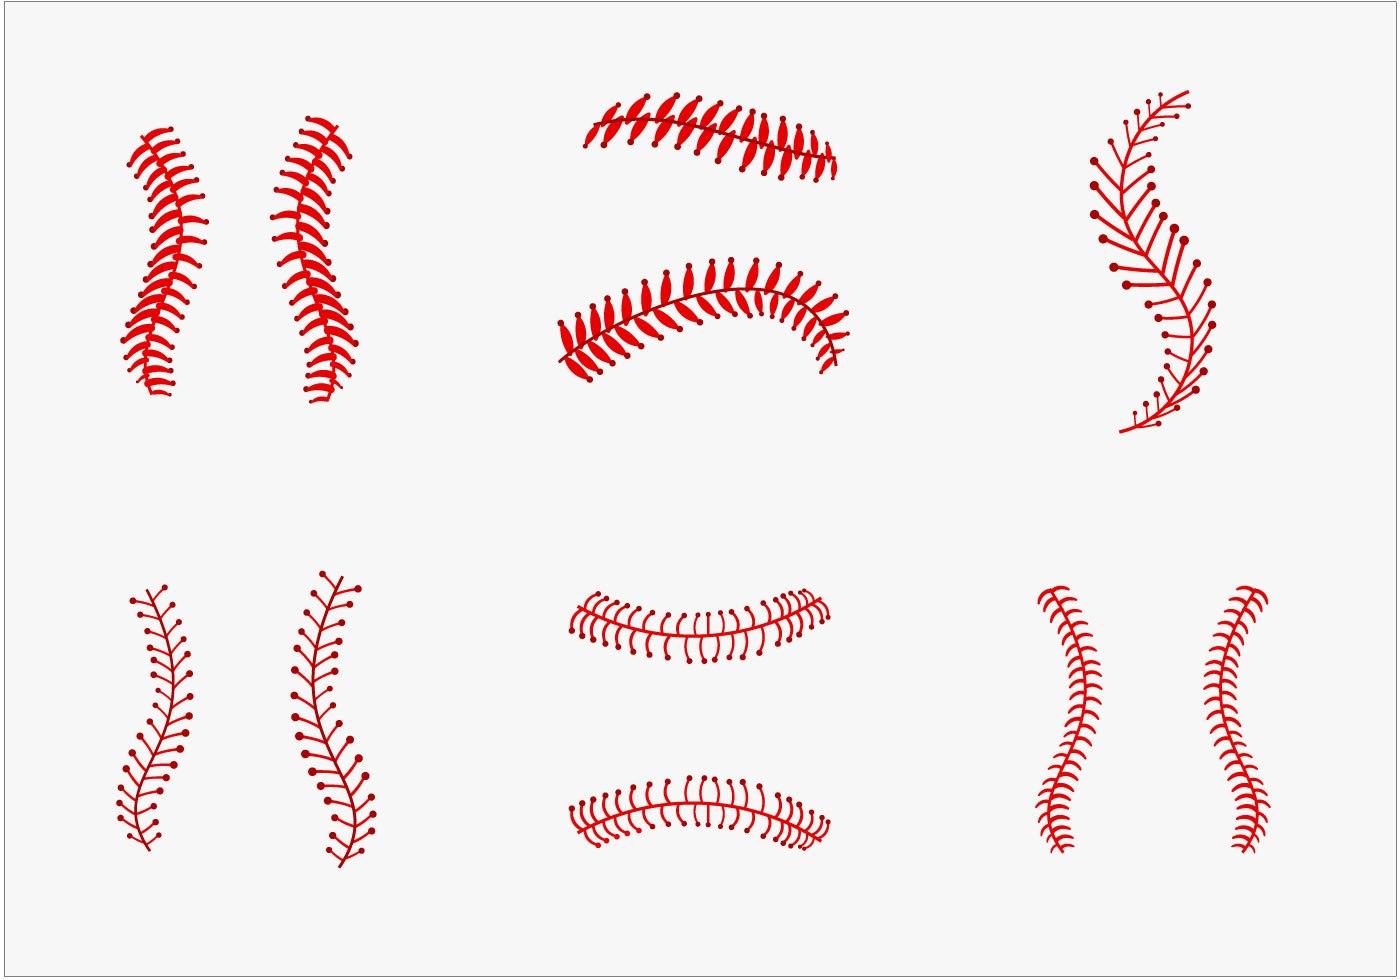 Softball laces clipart 6 » Clipart Portal.